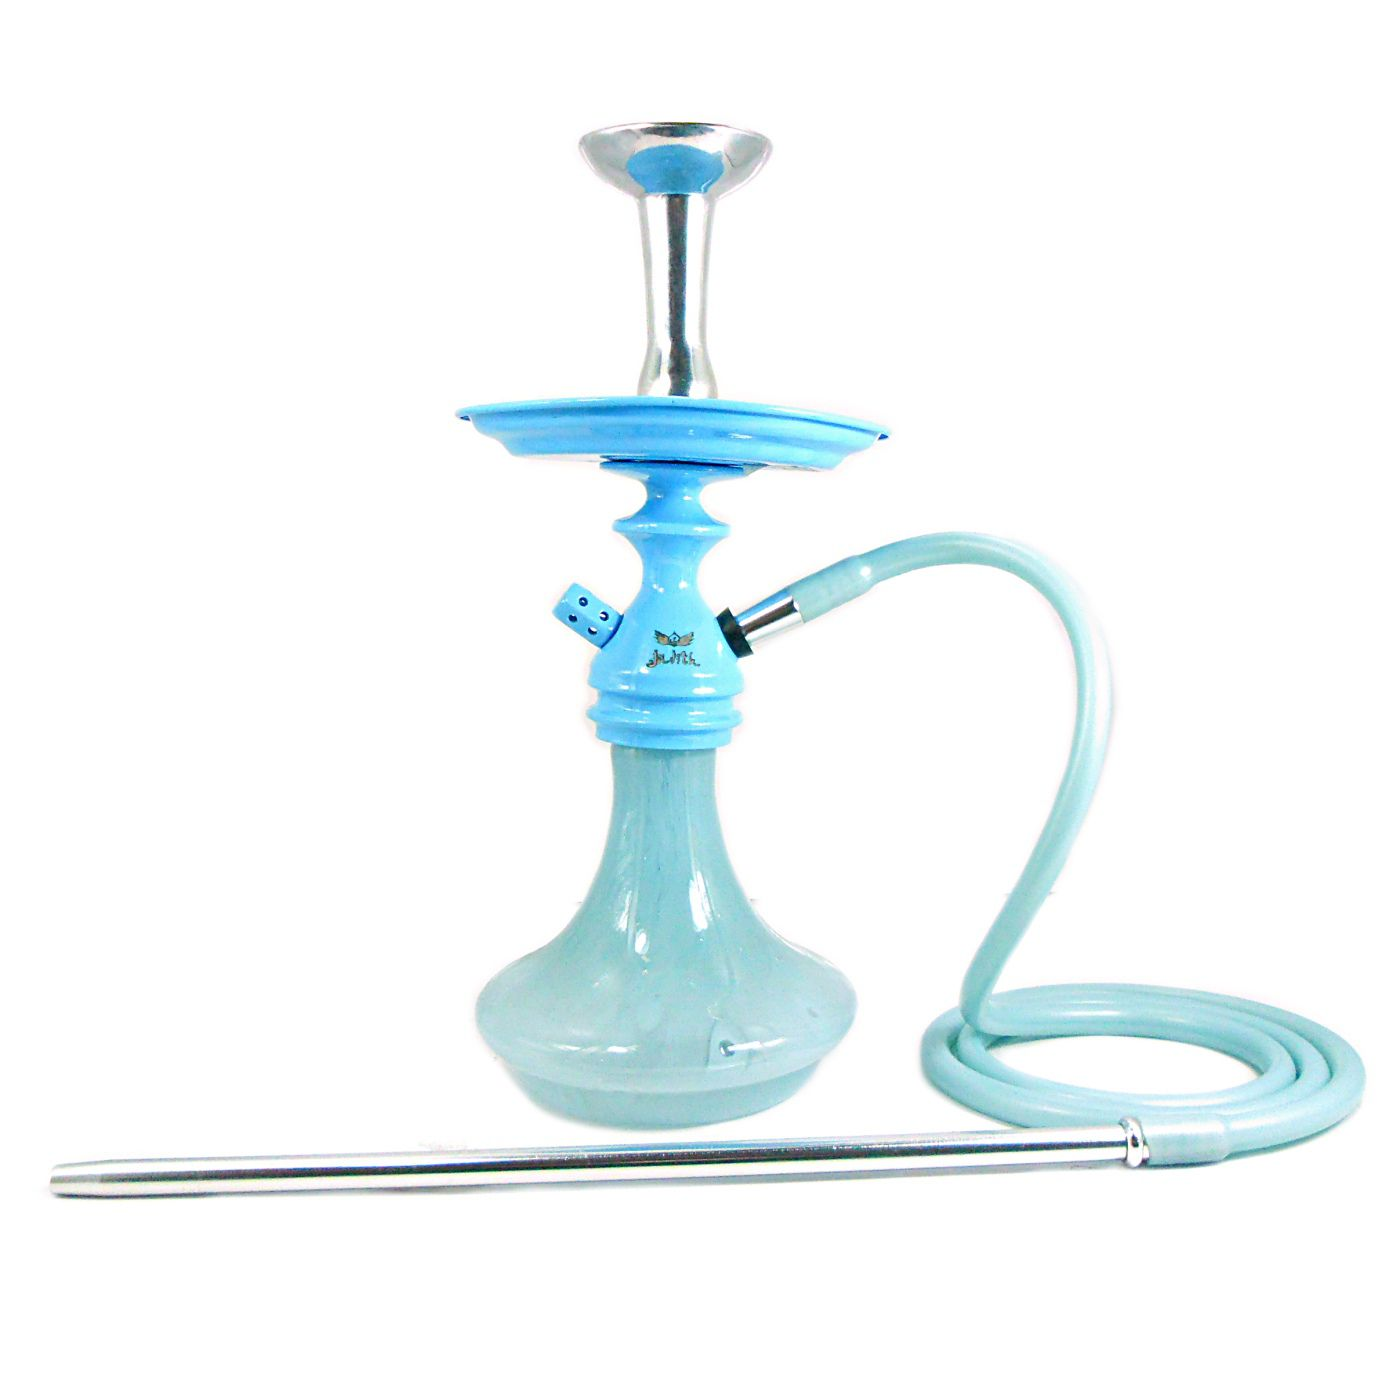 Narguile Judith Azul Claro, mangueira silicone, rosh e piteira alumínio, prato Judith, vaso Aladin.